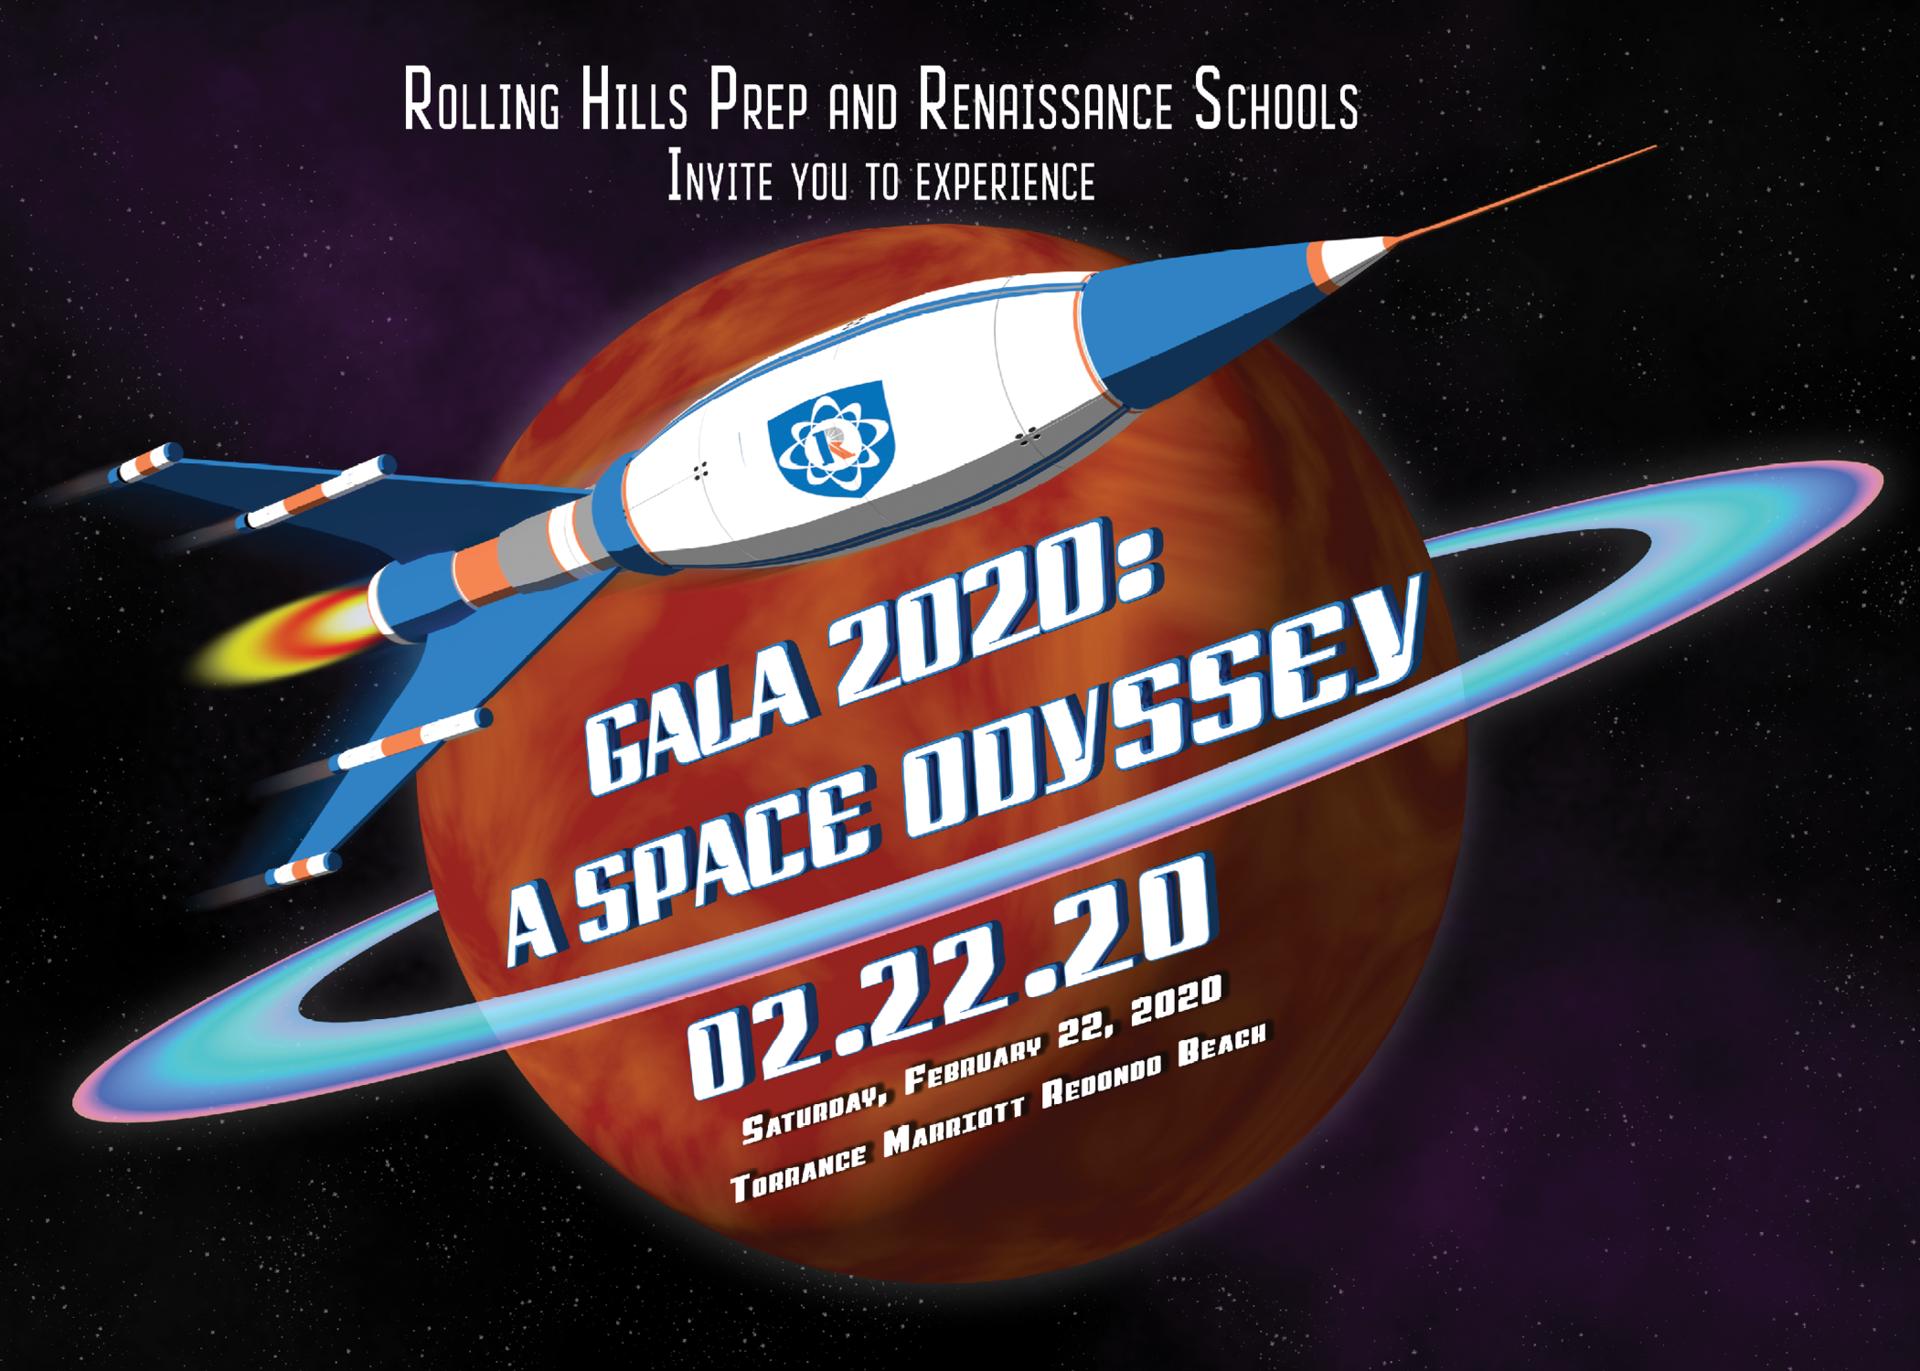 Gala 2020: A Space Odyssey